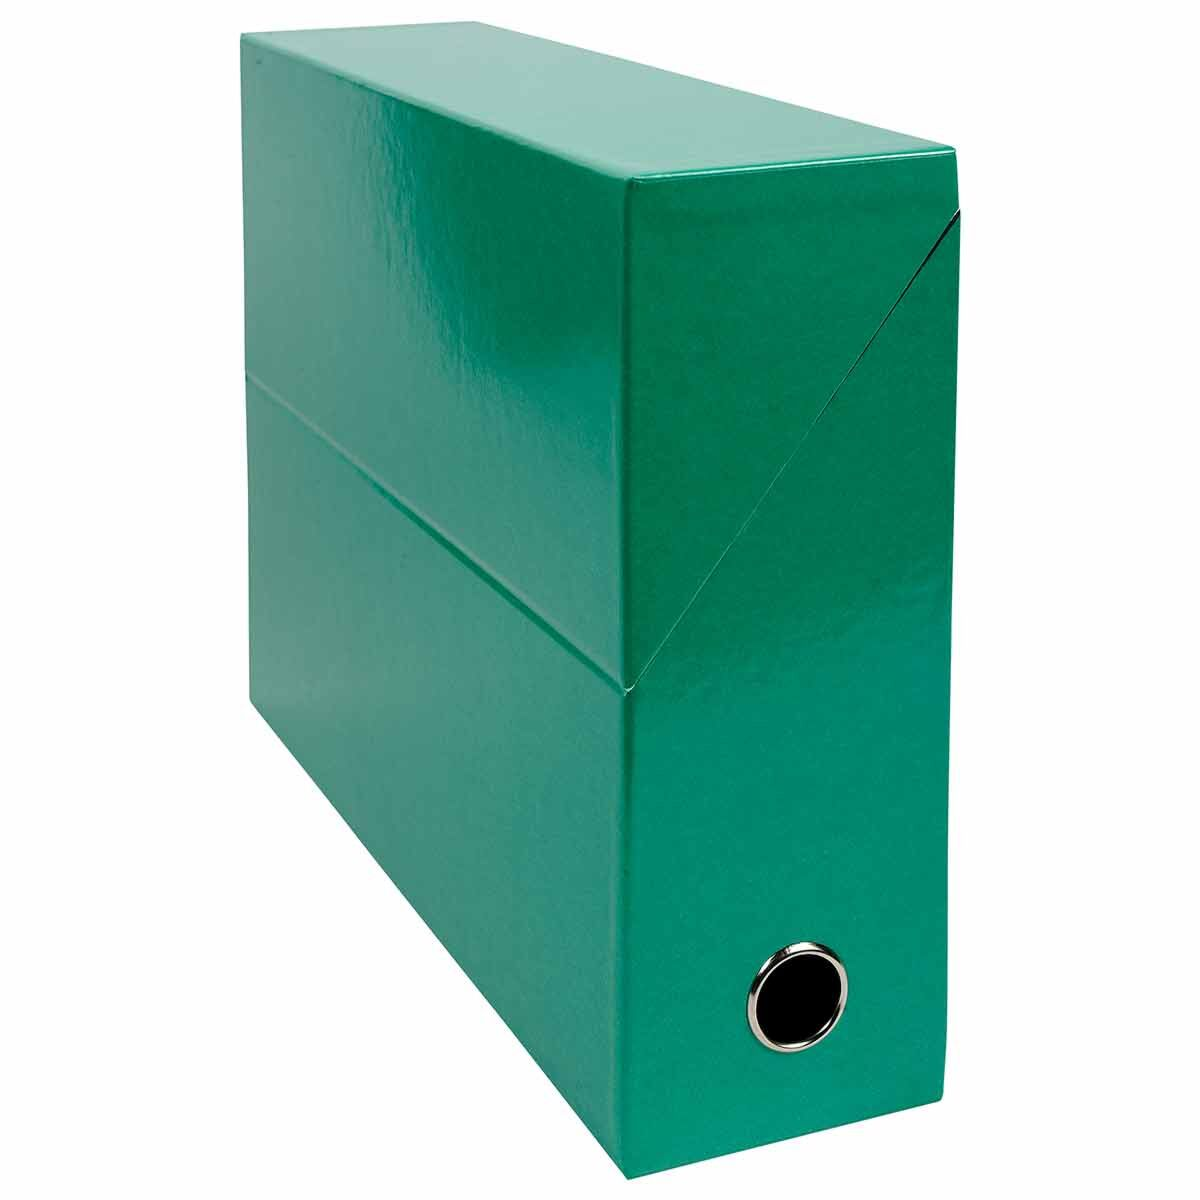 Exacompta Iderama Filing Box 90mm Pack of 5 Dark Green